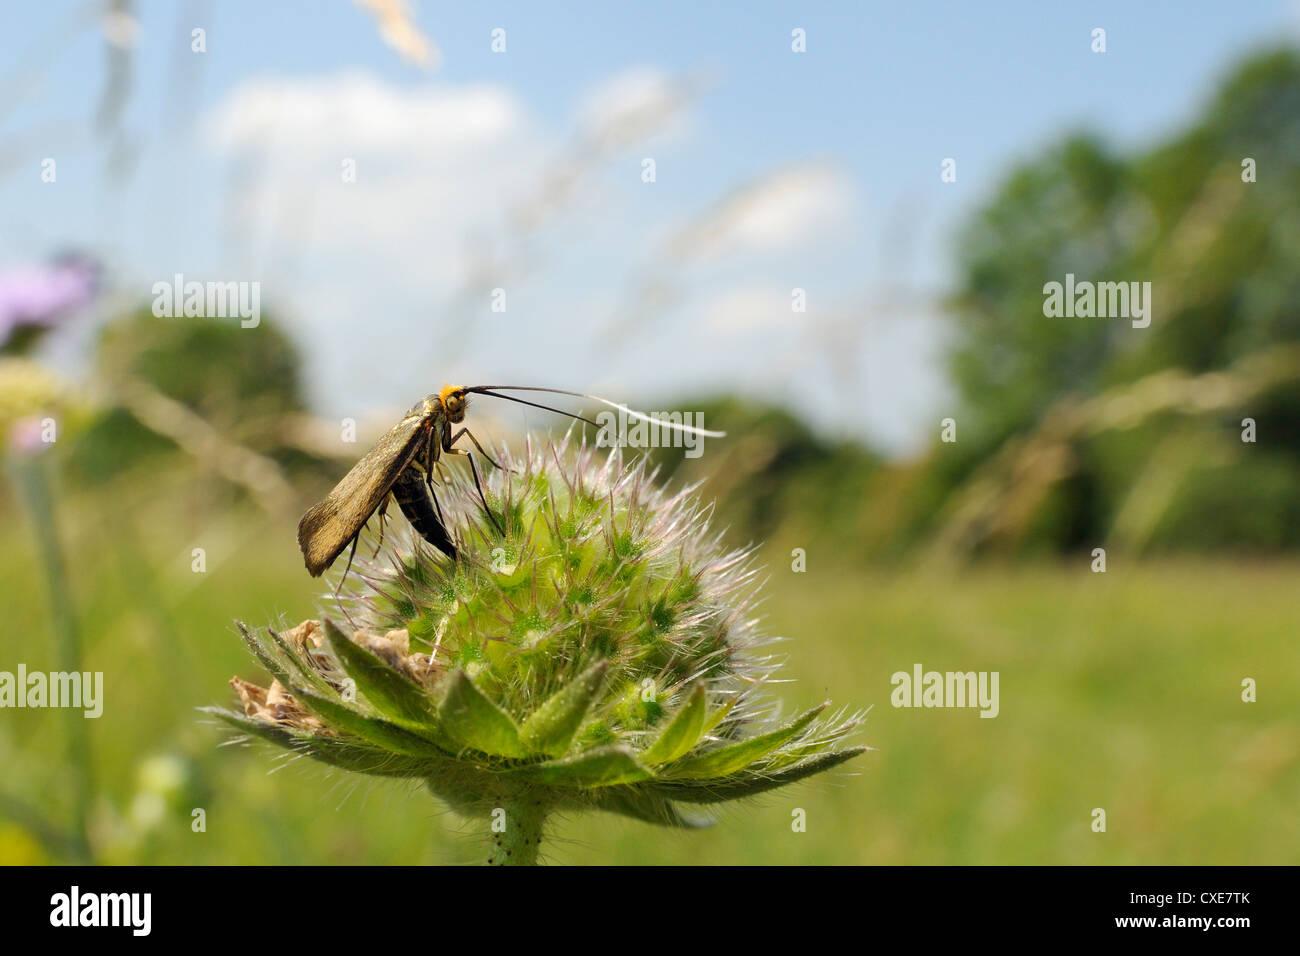 Weibliche Longhorn Moth (Nemophora Metallica), Eiablage in Feld Witwenblume (Knautia Arvensis) Seedhead, UK Stockbild